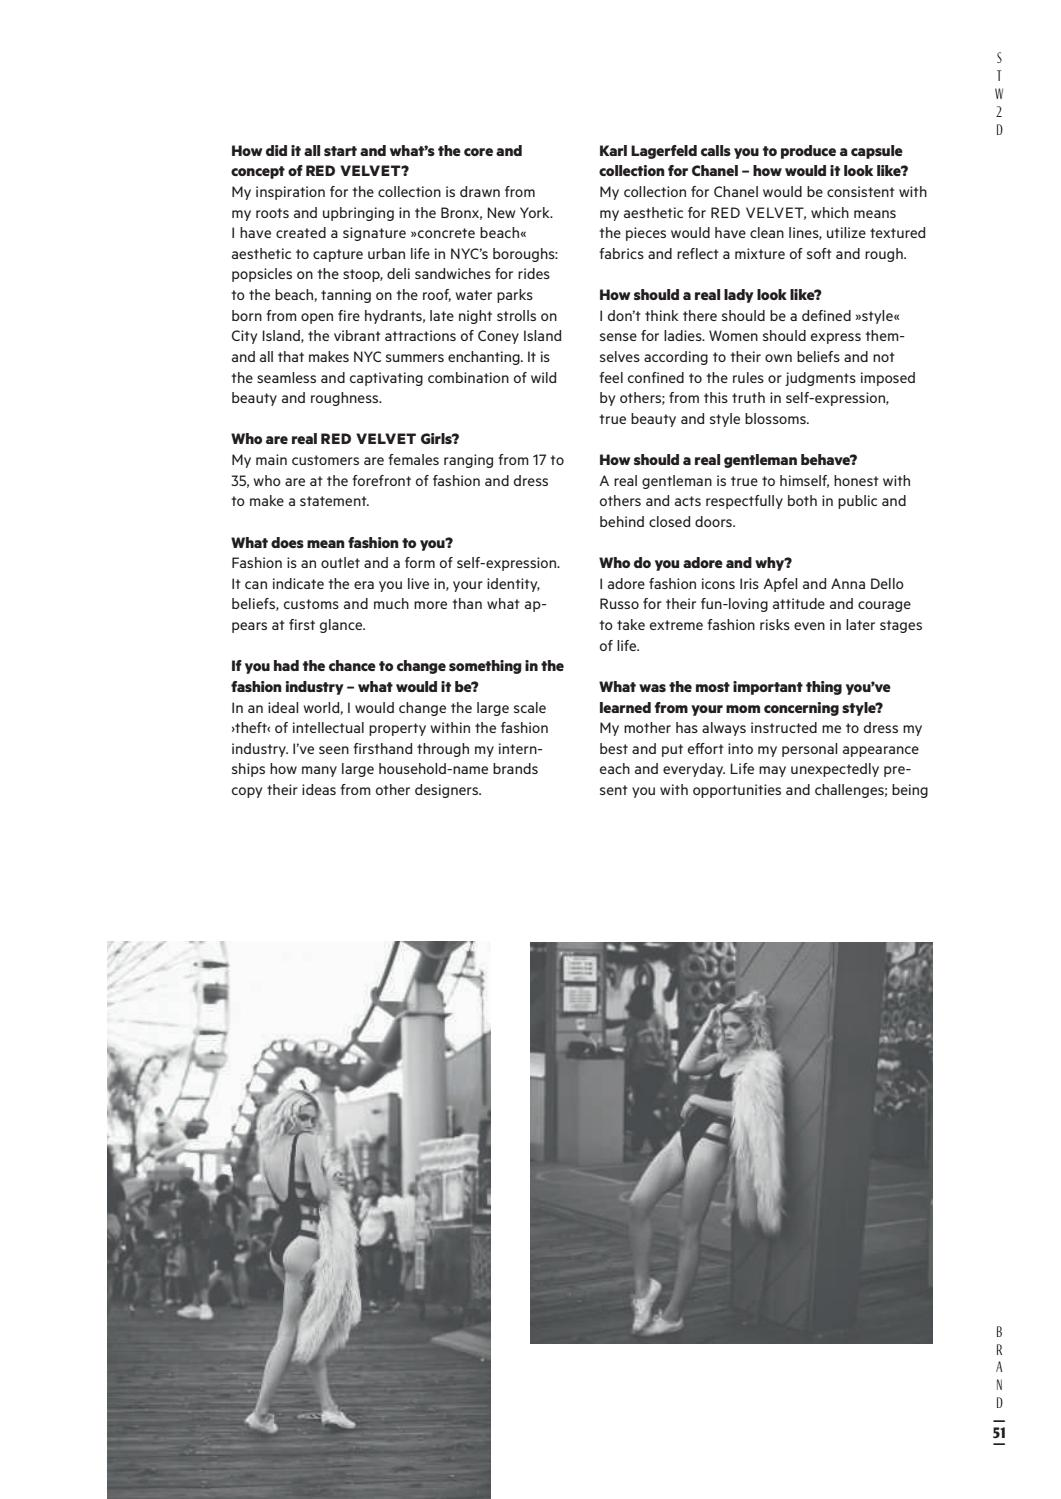 e0c09443c9b42b Stw2d 56 girls edition by streetwear today magazine - issuu